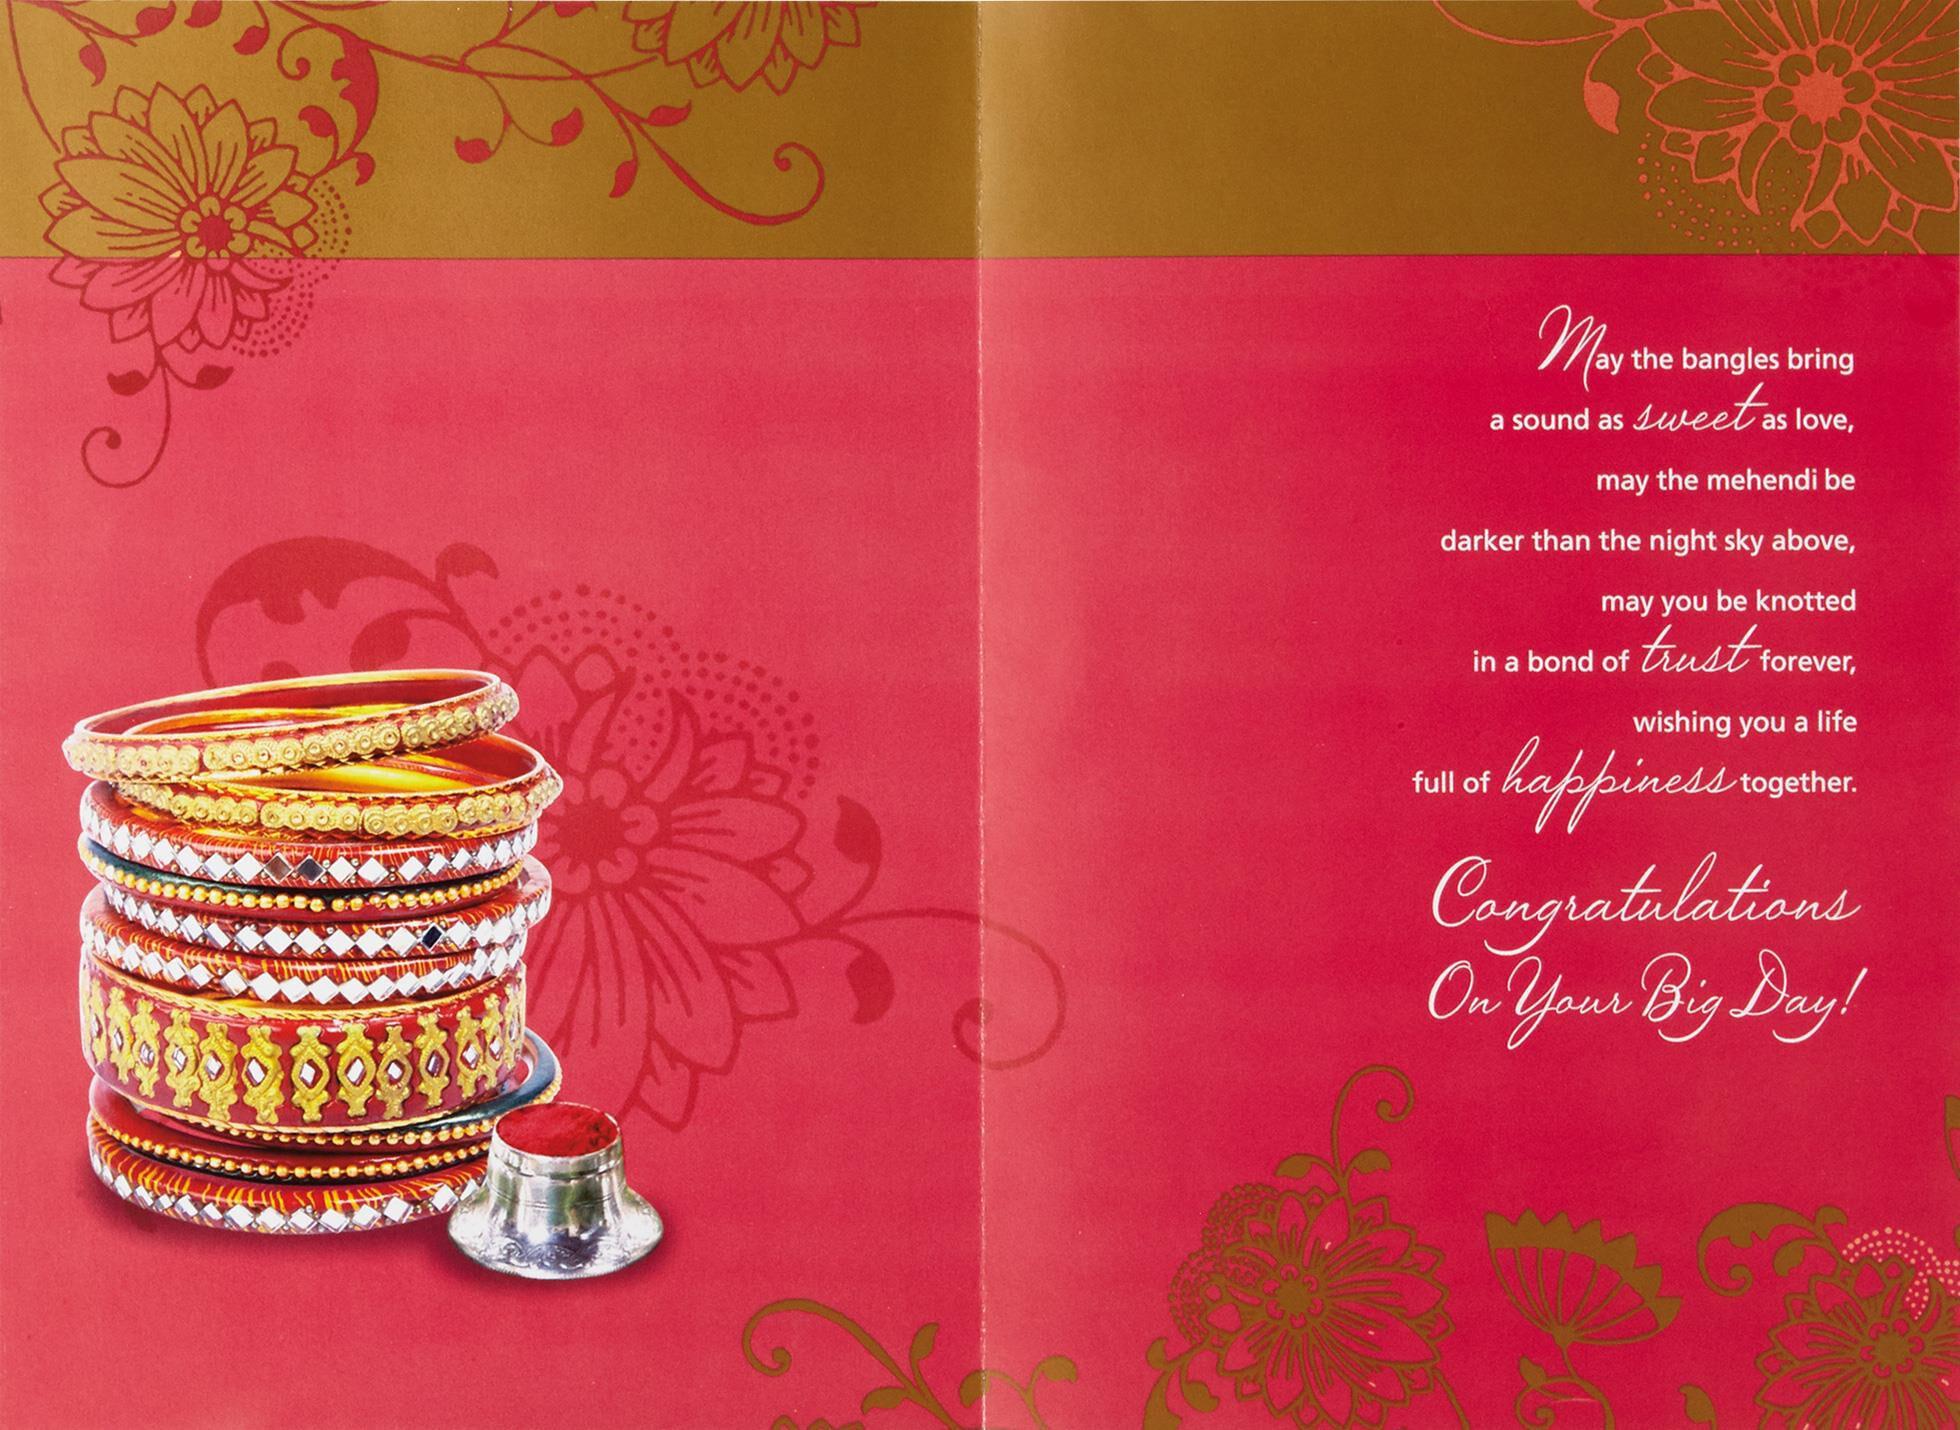 Warm Wishes Wedding Card - Greeting Cards - Hallmark